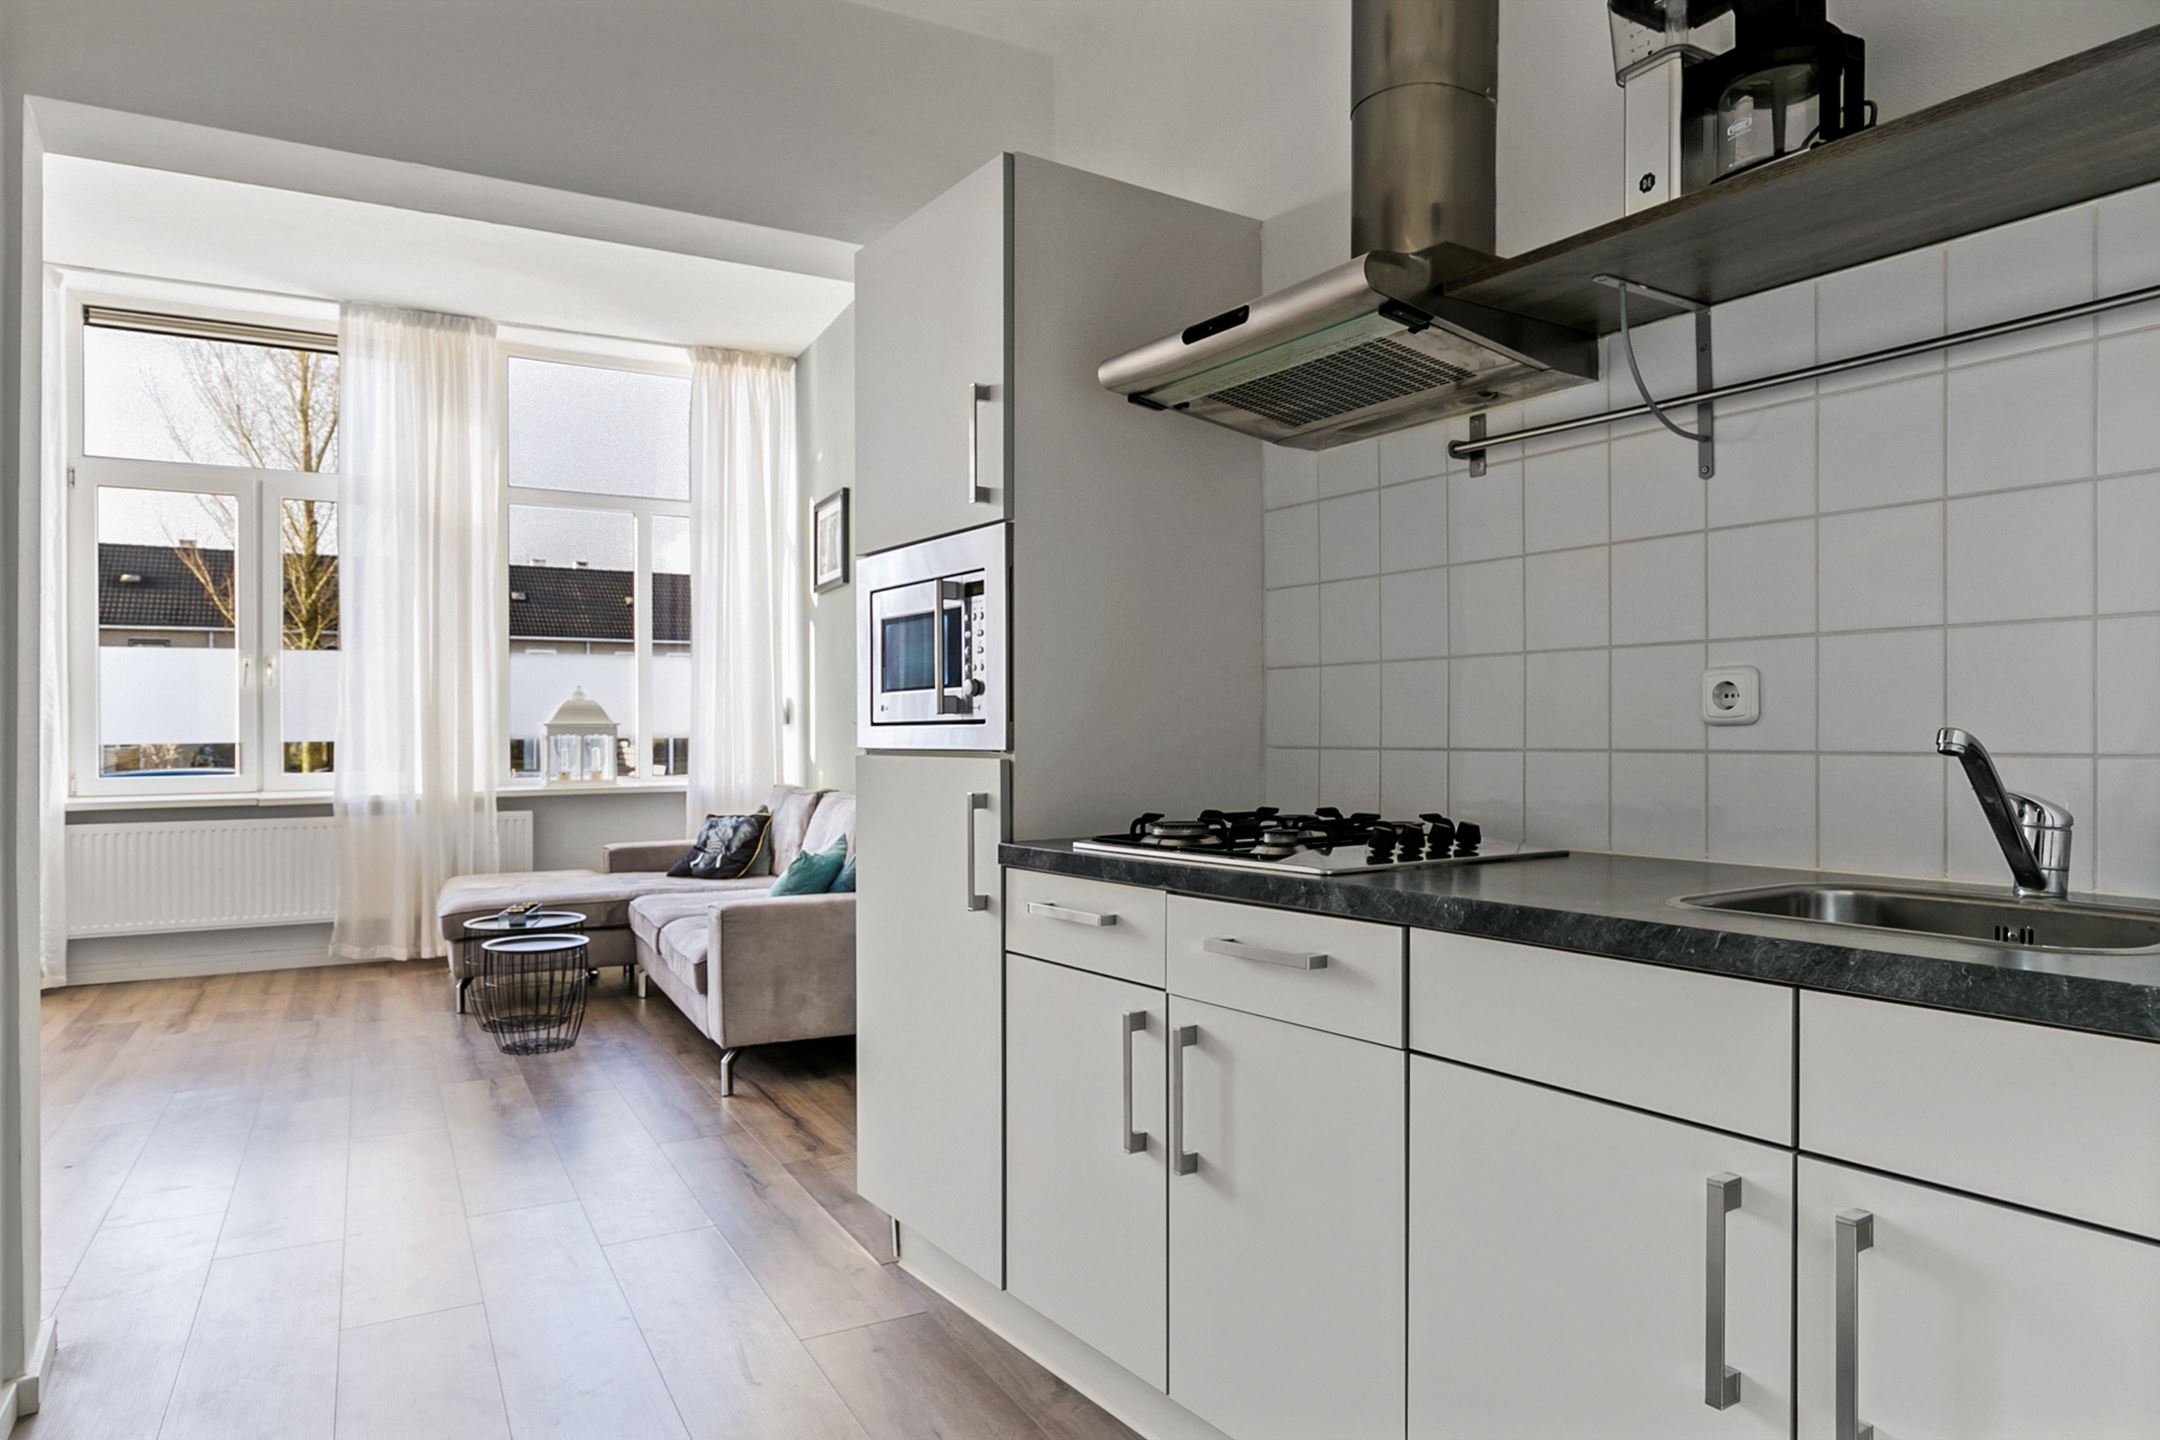 Badkamer Keuken Bolsward : Appartement te koop: laag bolwerk 45 a 8701 kt bolsward [funda]